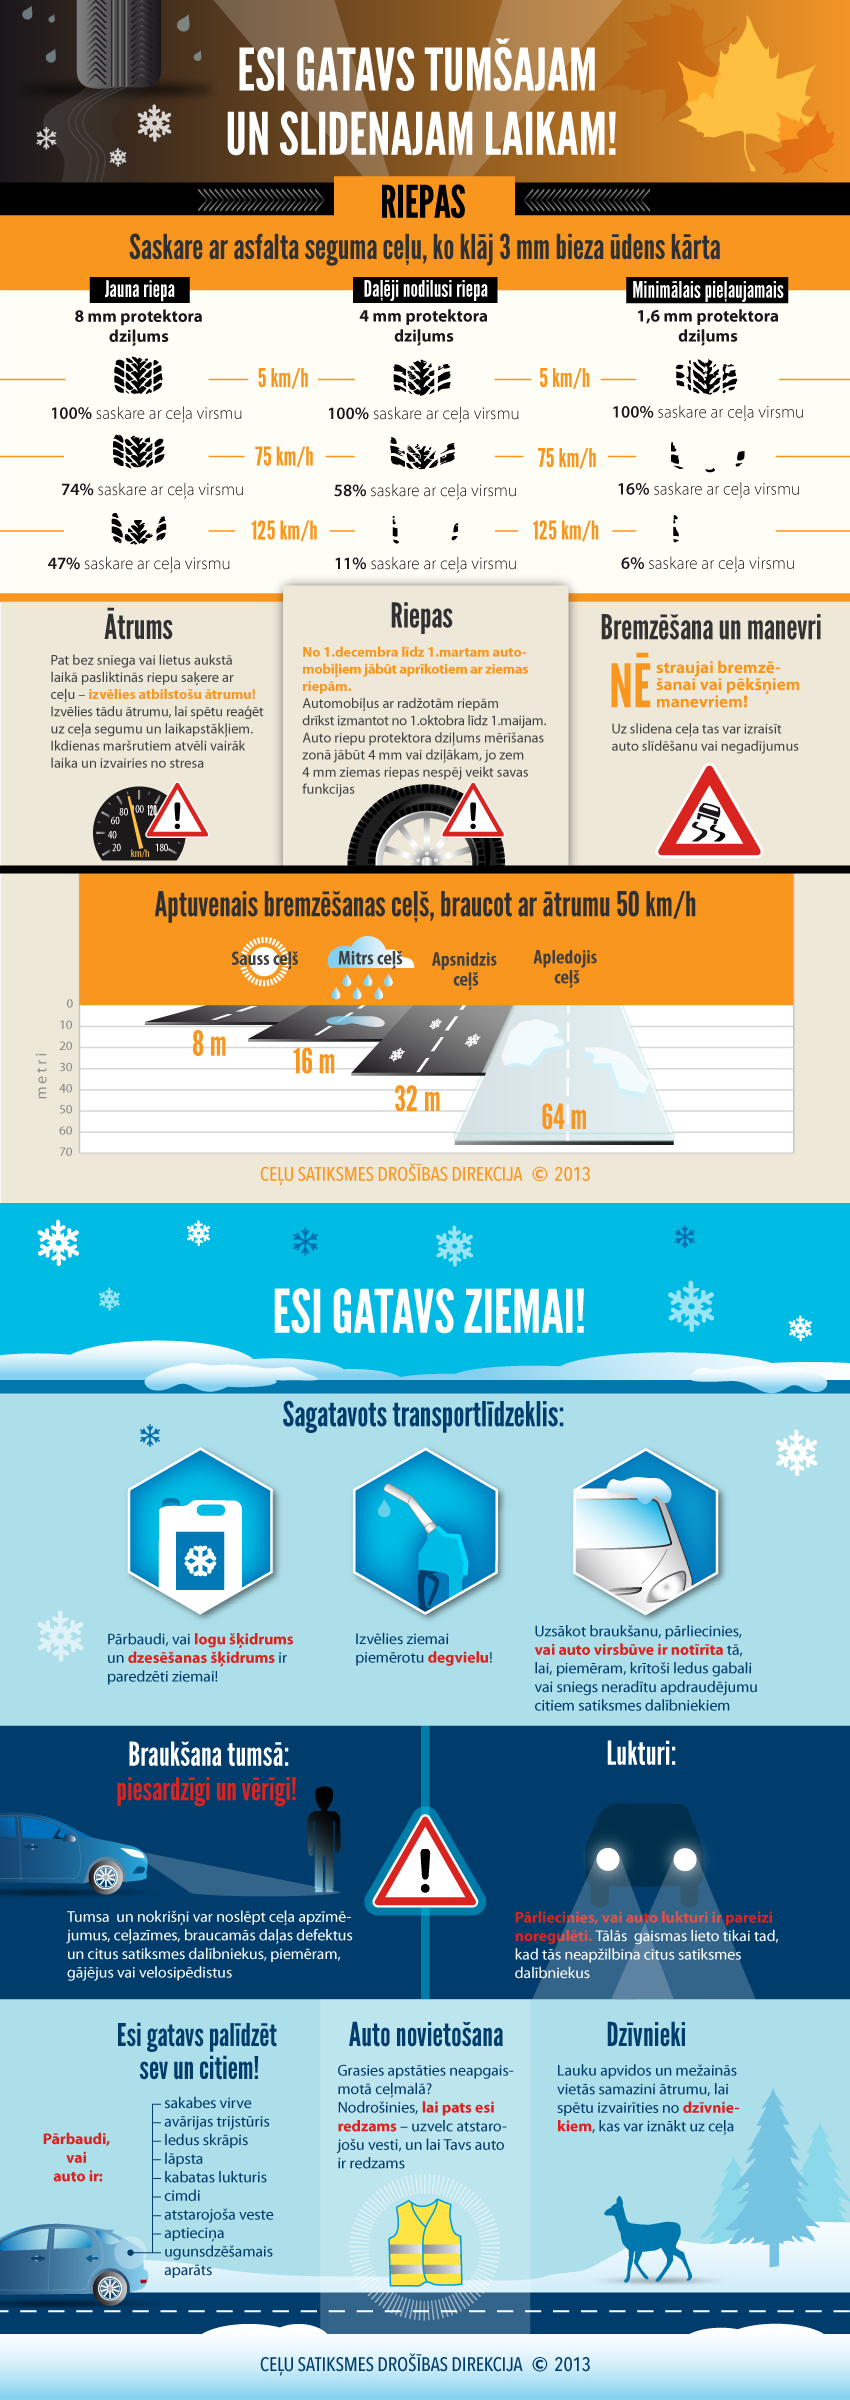 Infografika: Esi gatavs tumšajam un slidenajam laikam!